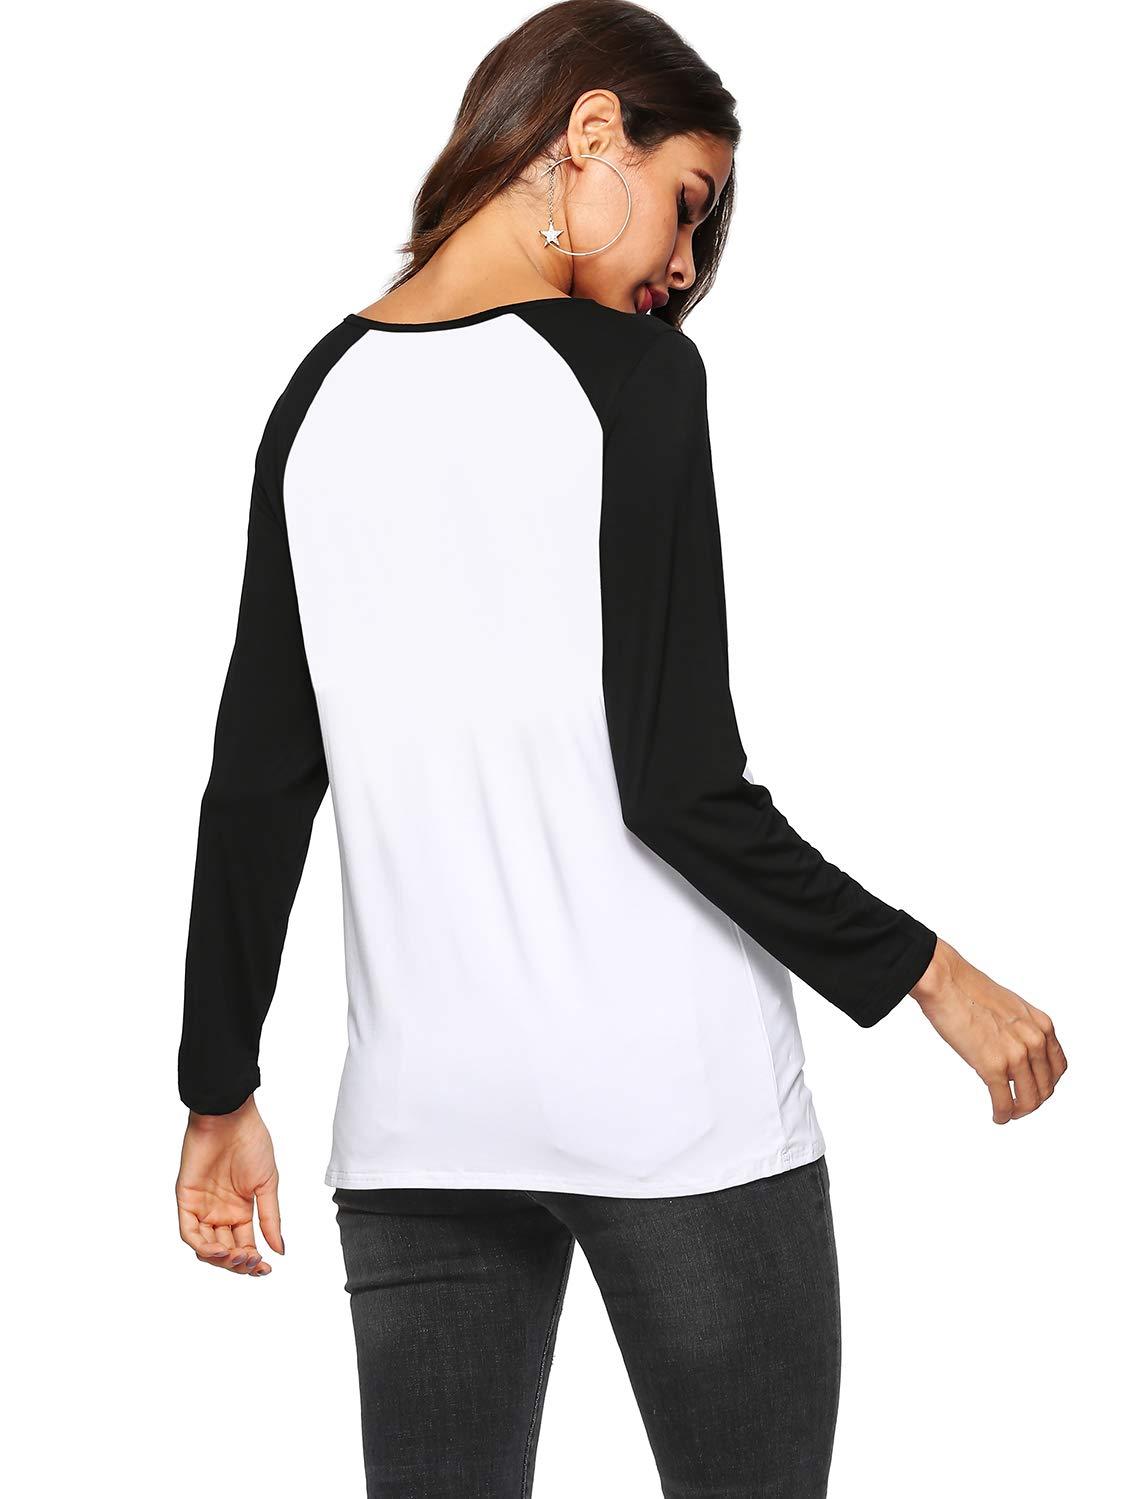 Amortu Women's Crew Neck Shirts Sretch Long Sleeve Raglan Baseball T-Shirt Black L by Amoretu (Image #2)